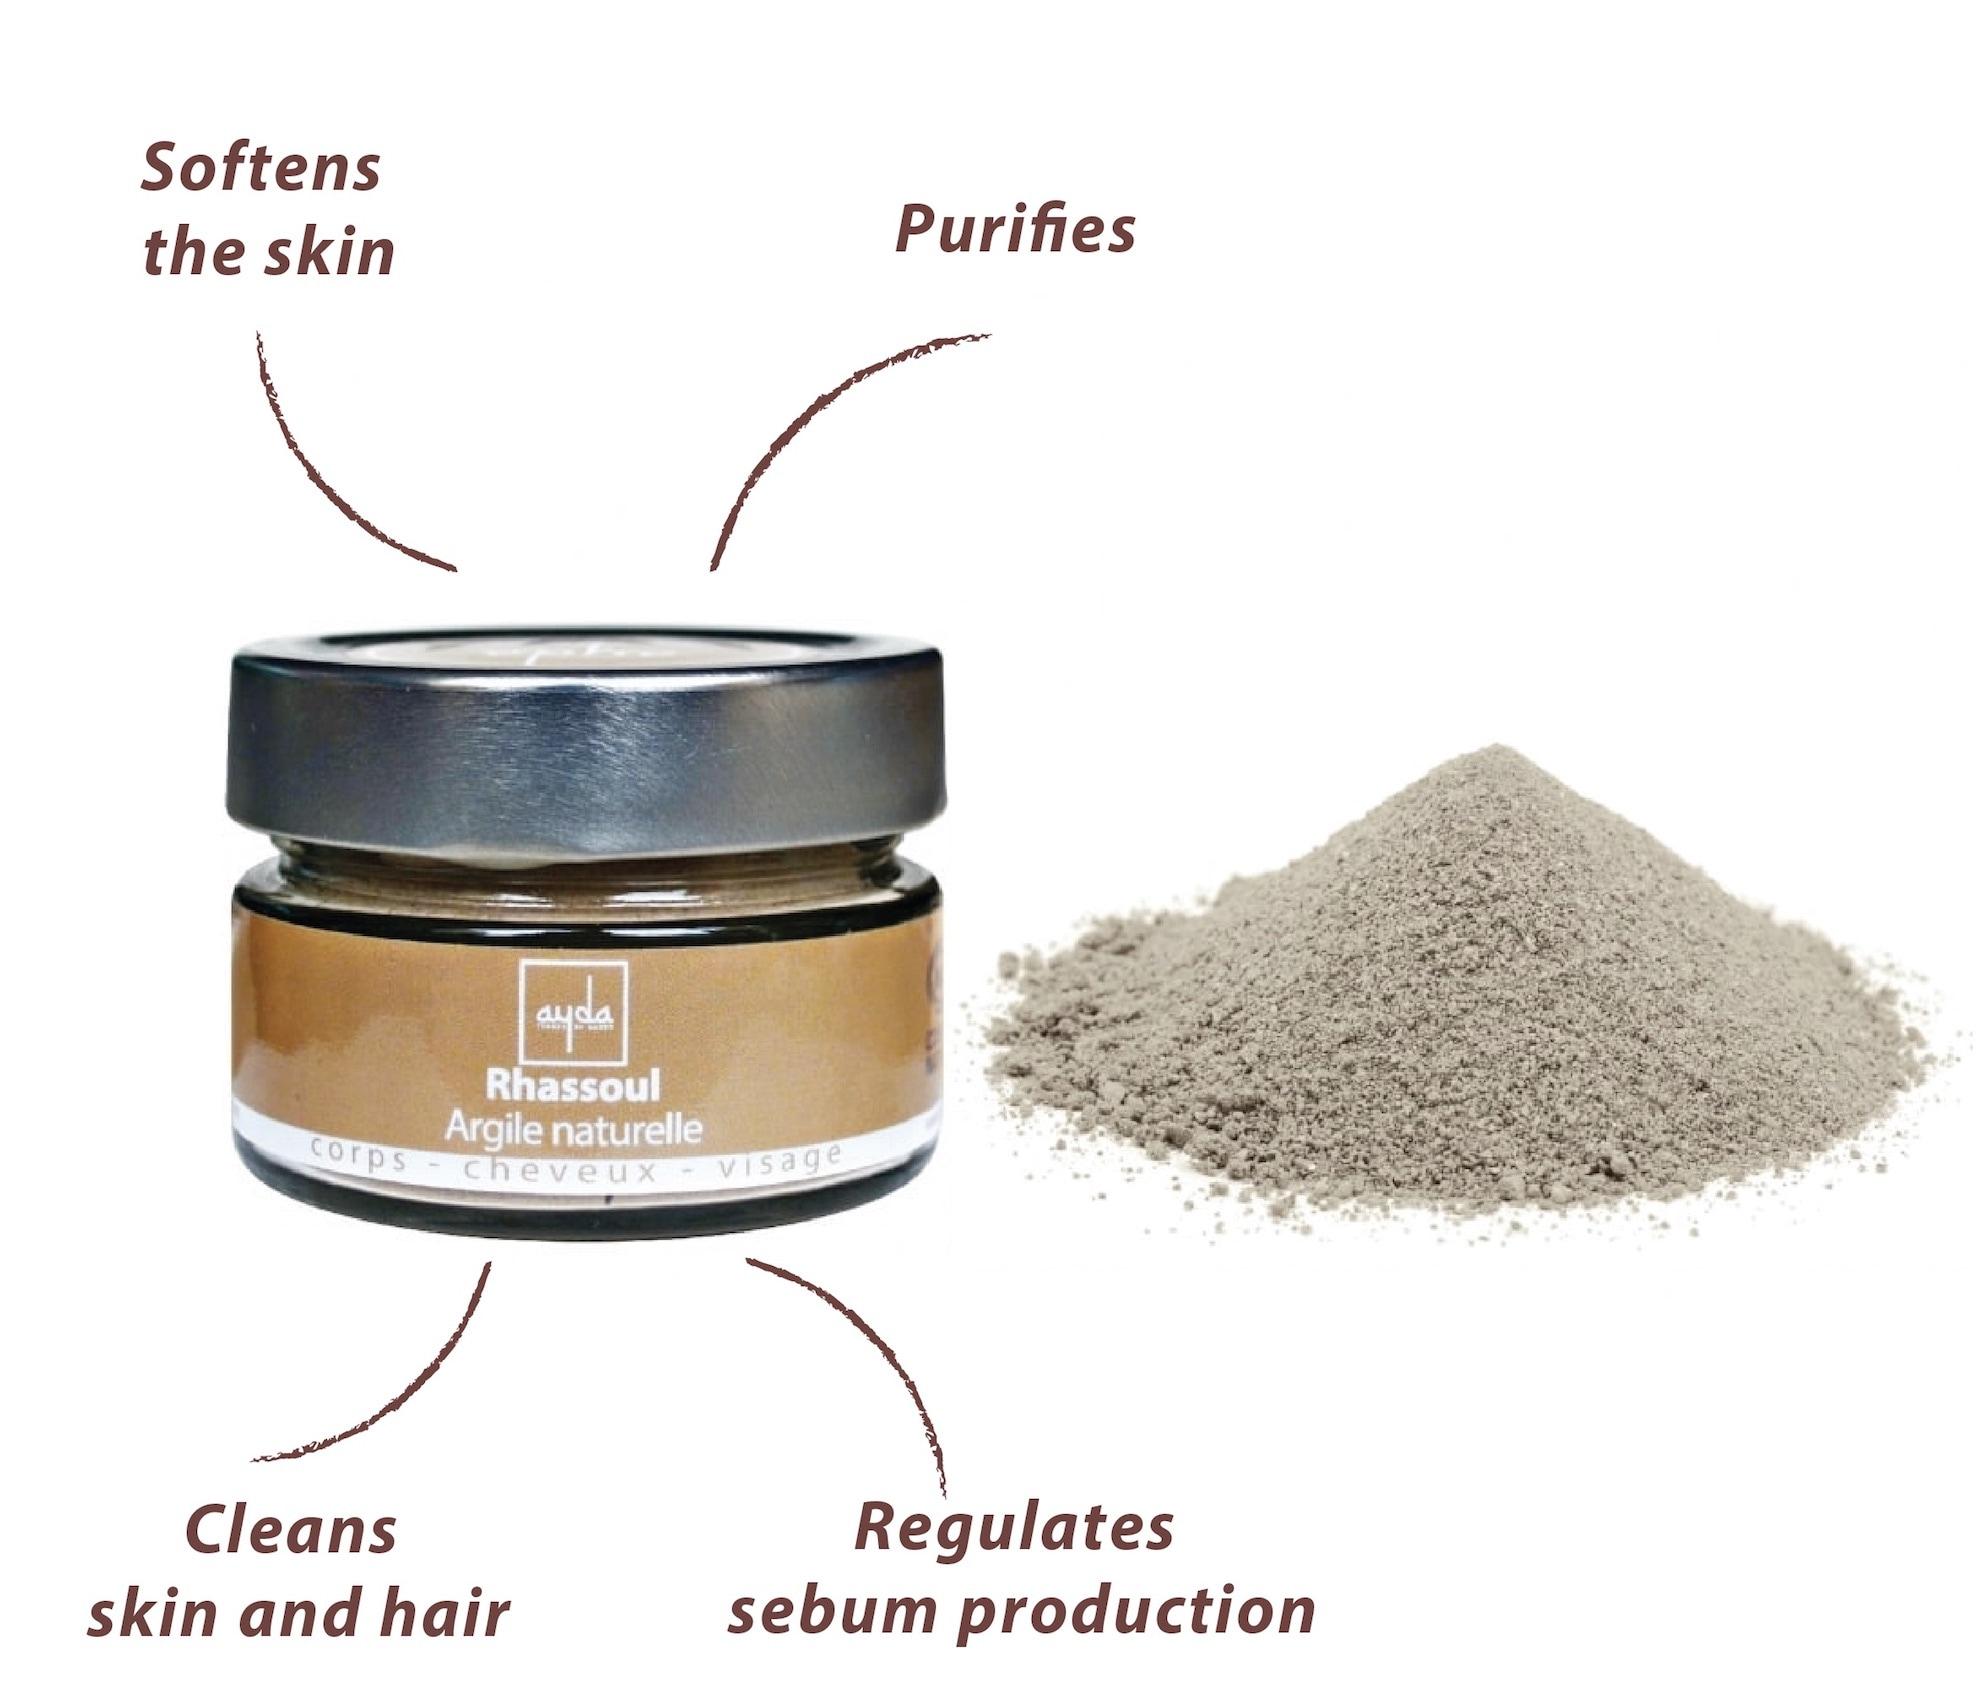 rhassoul clay benefits